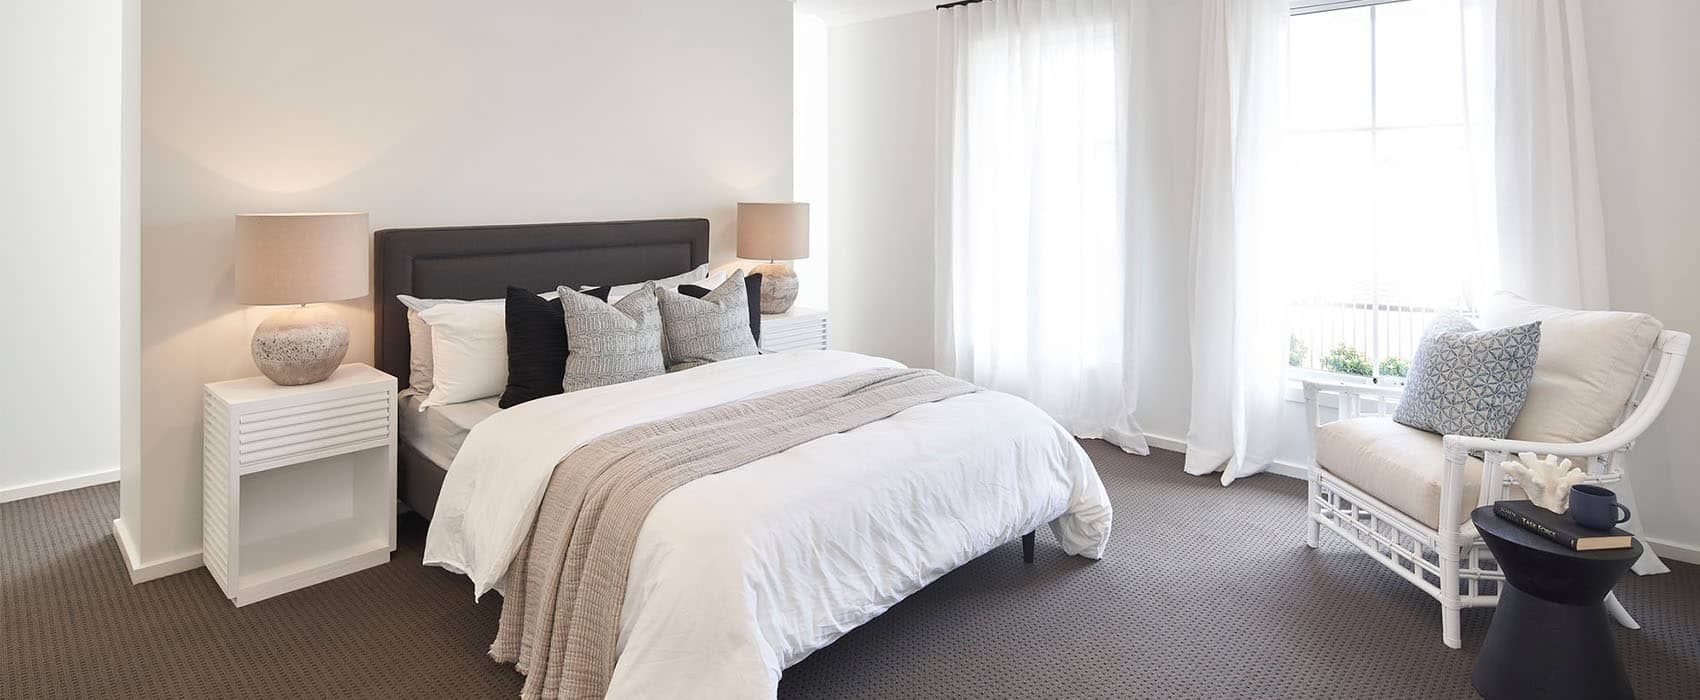 masterton-malibu29-northhampton_bedroom_01 Interior